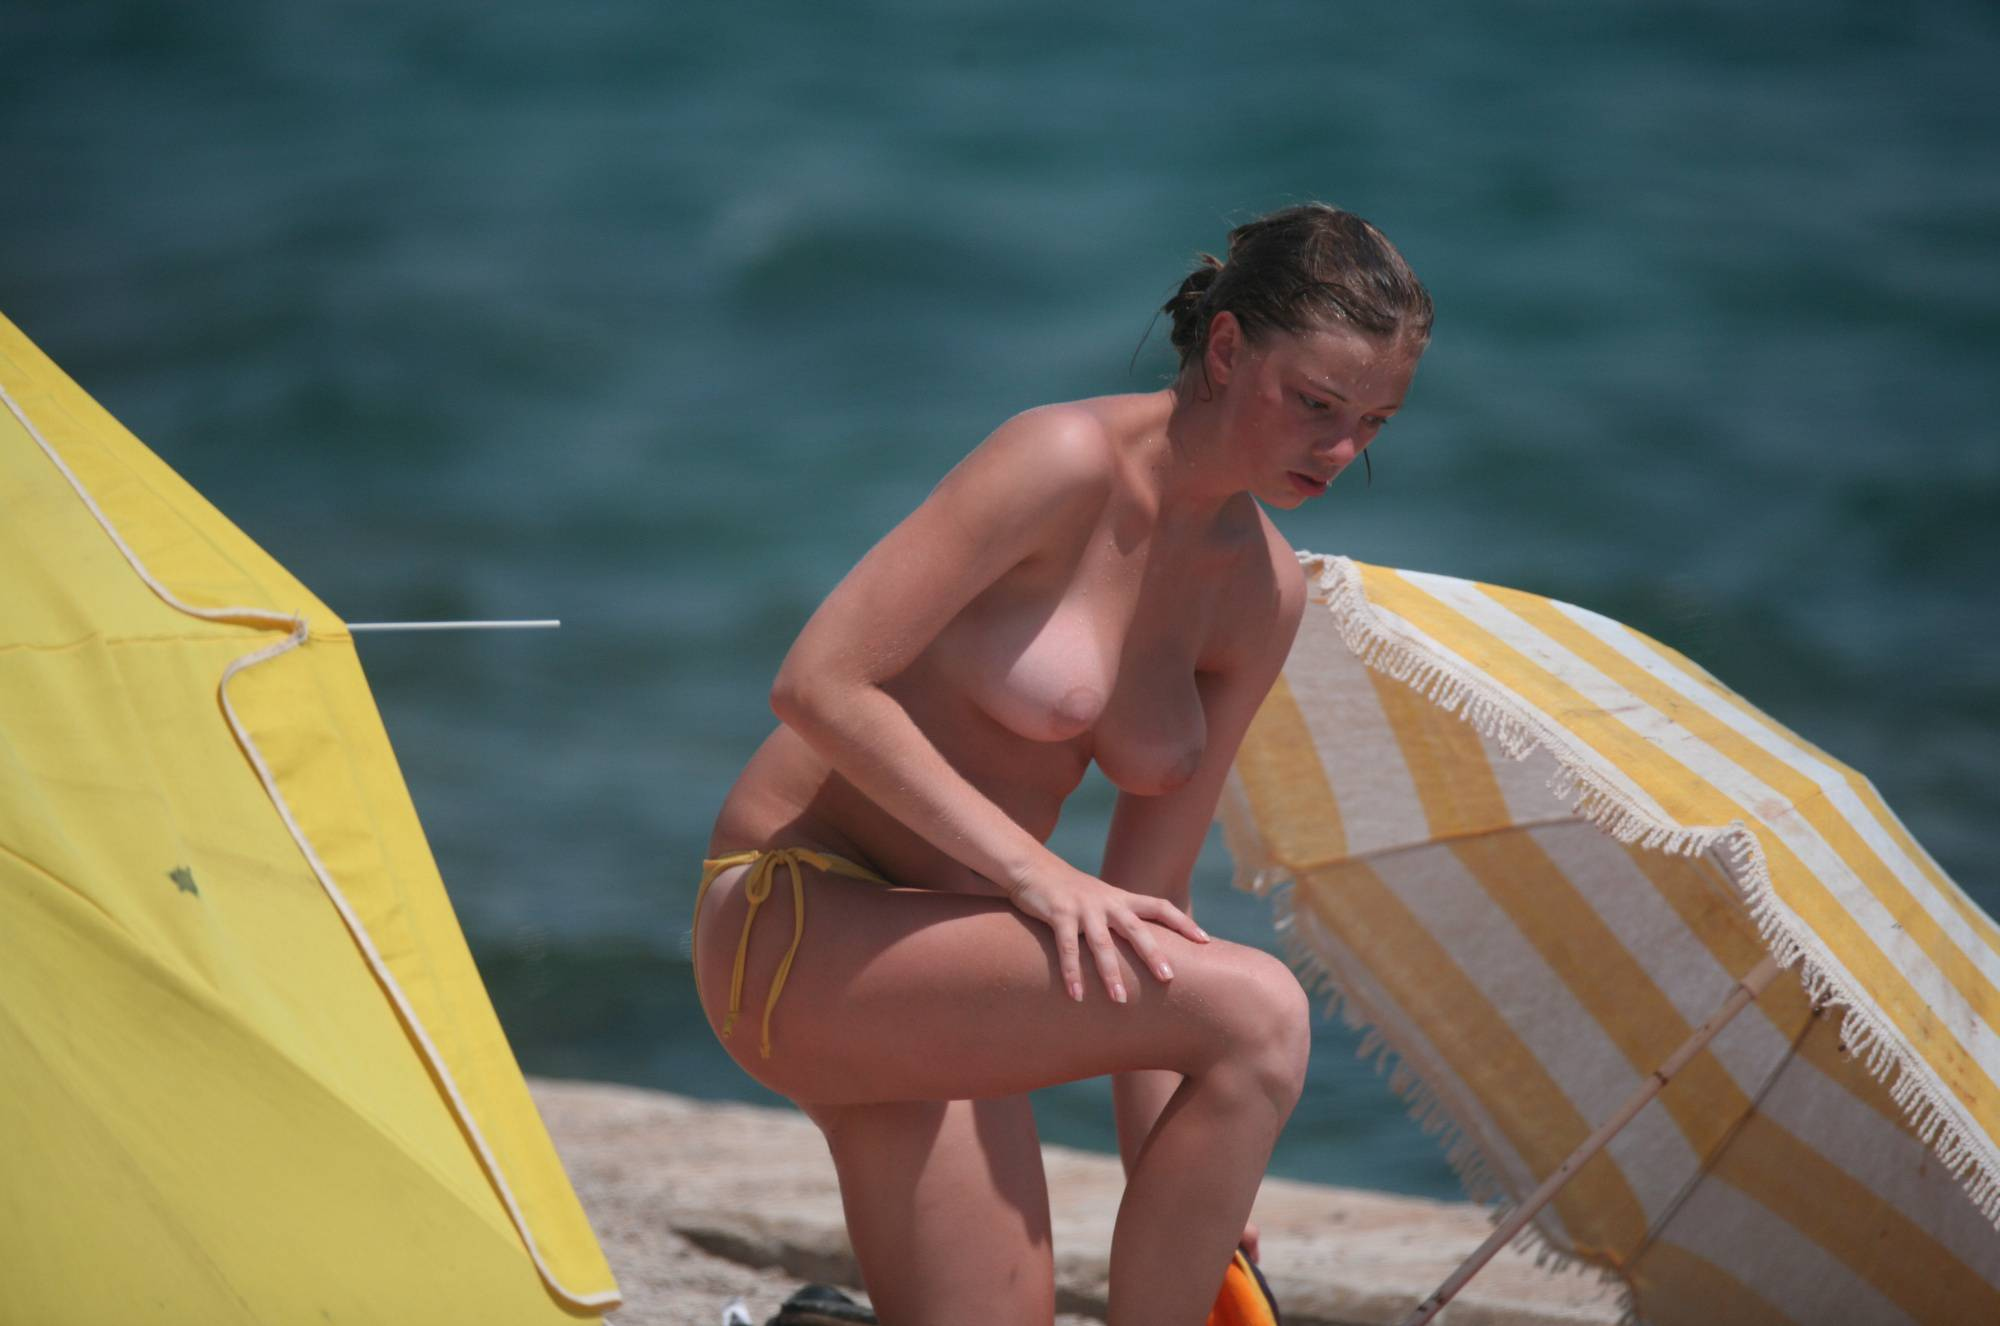 Nudist Pics Single Girl Umbrella Setup - 1